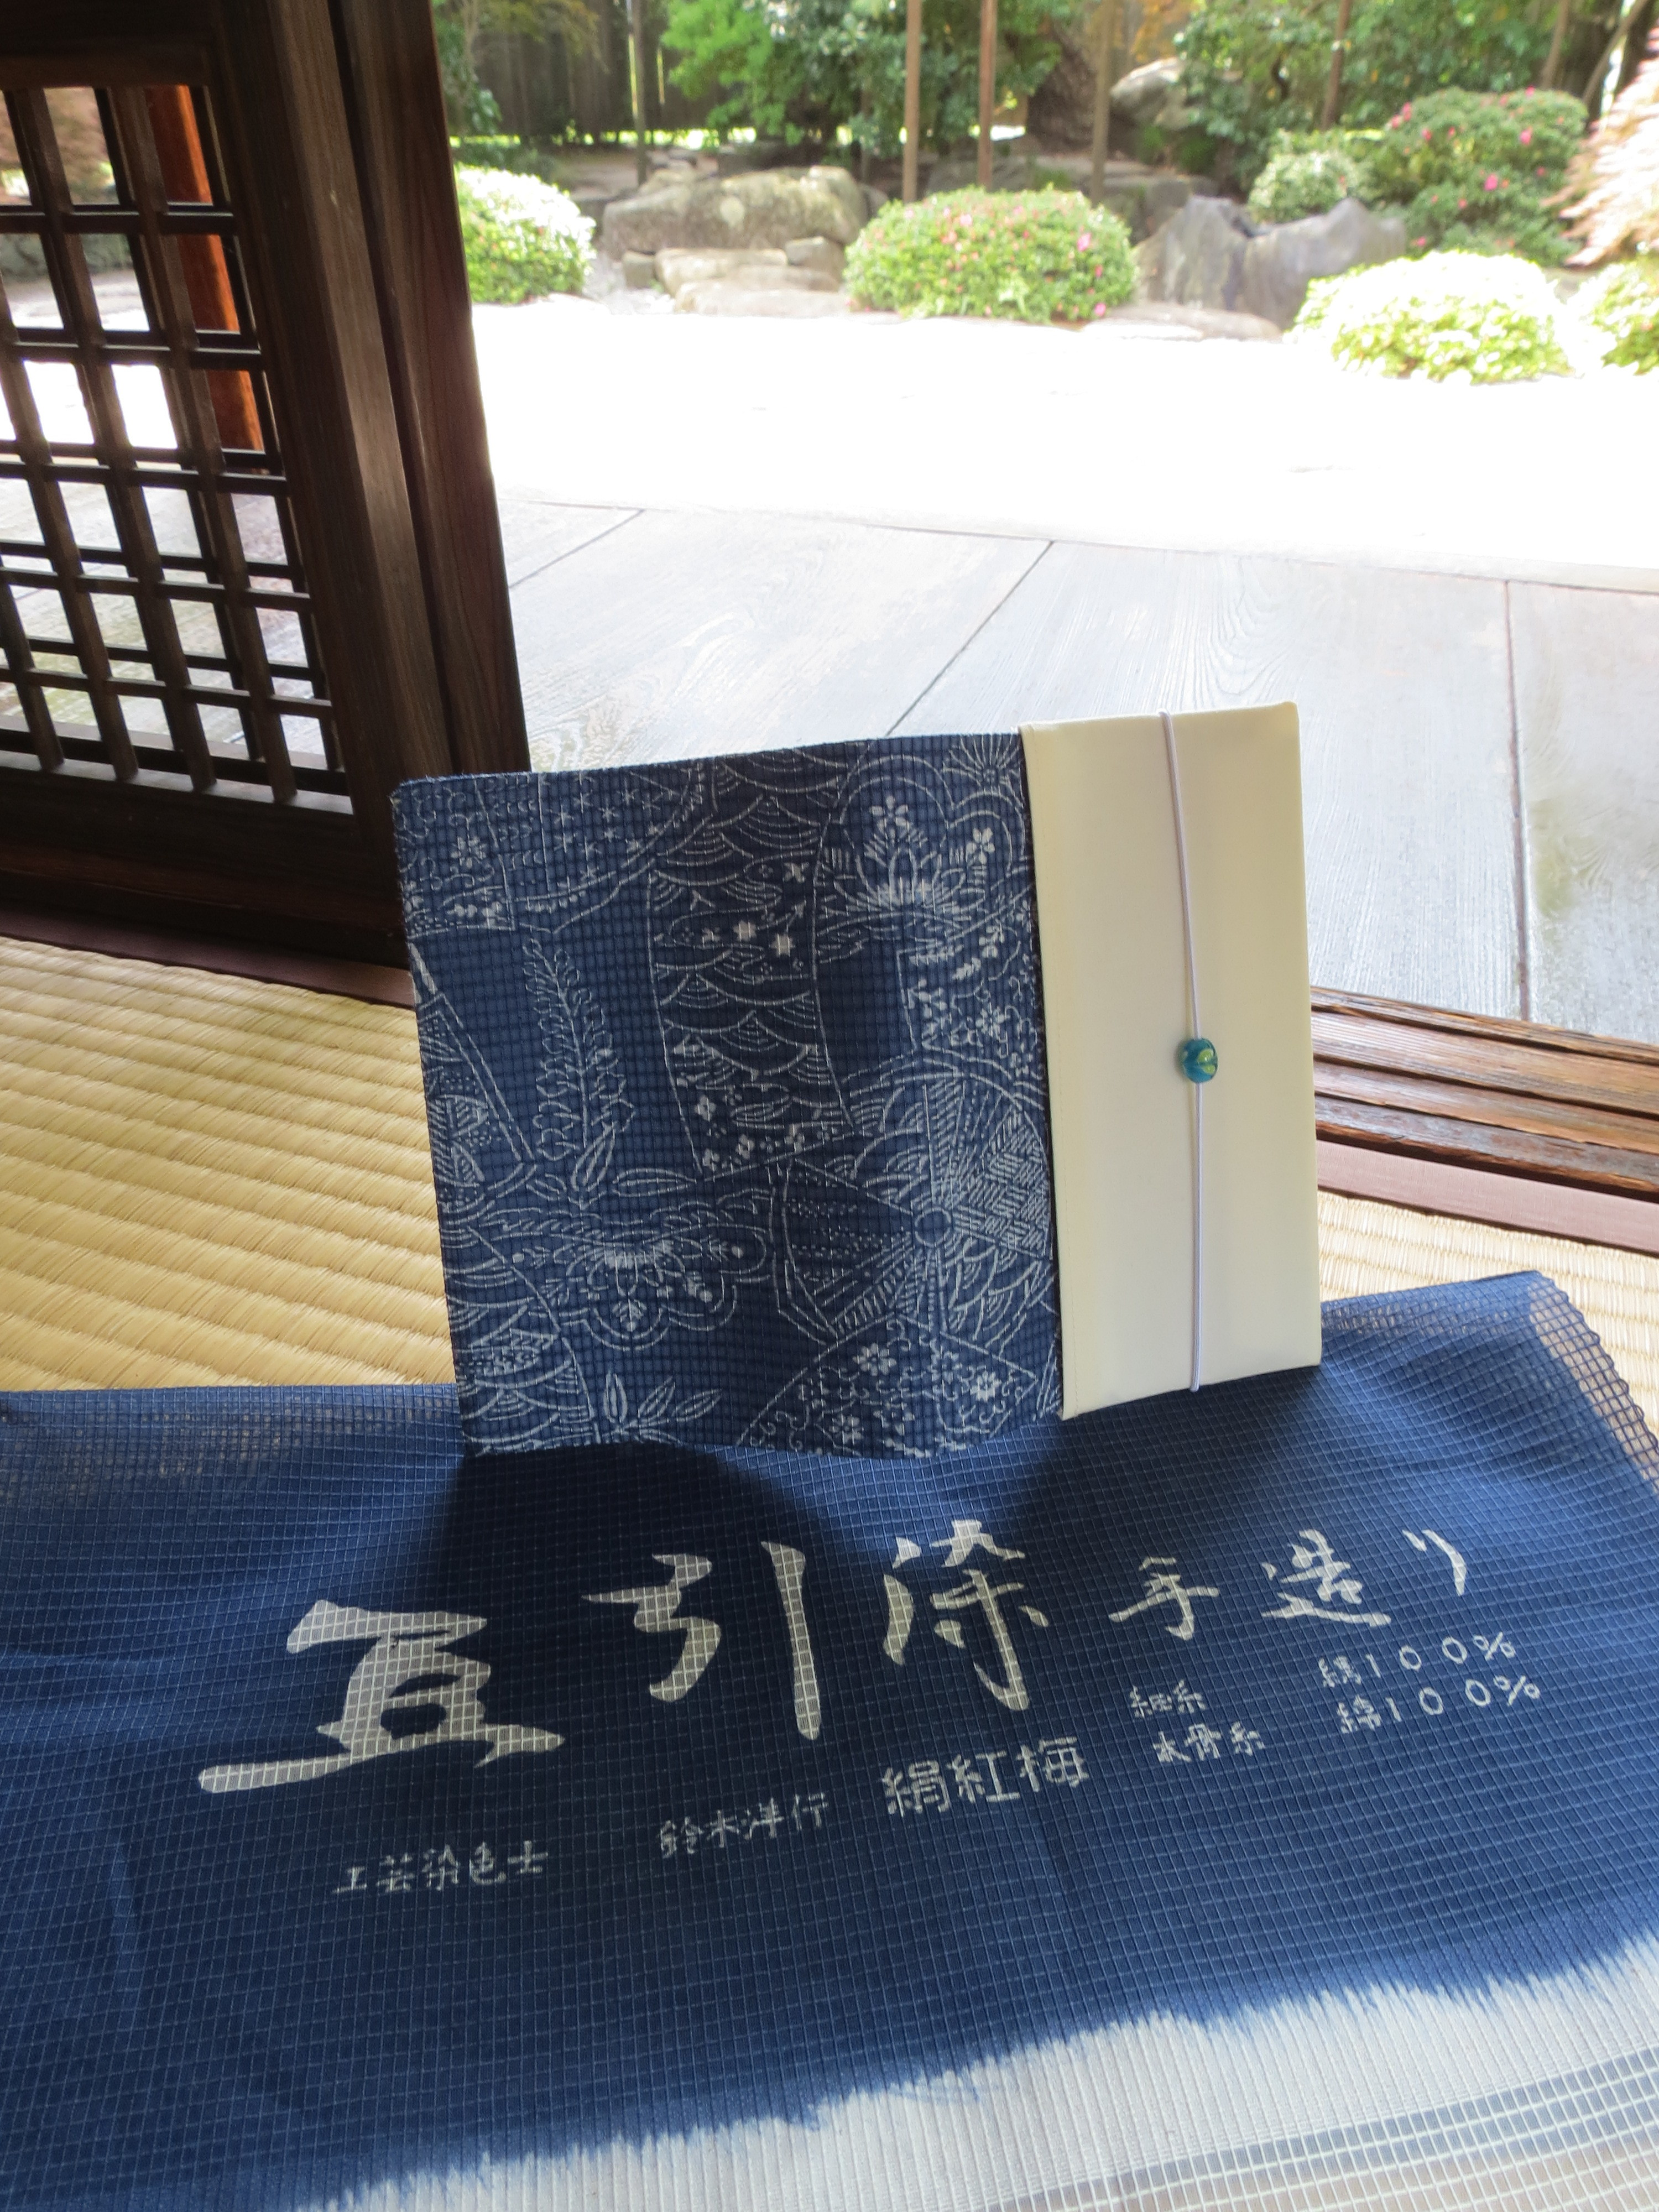 江戸中型長板豆引き染め(吉祥文柄)